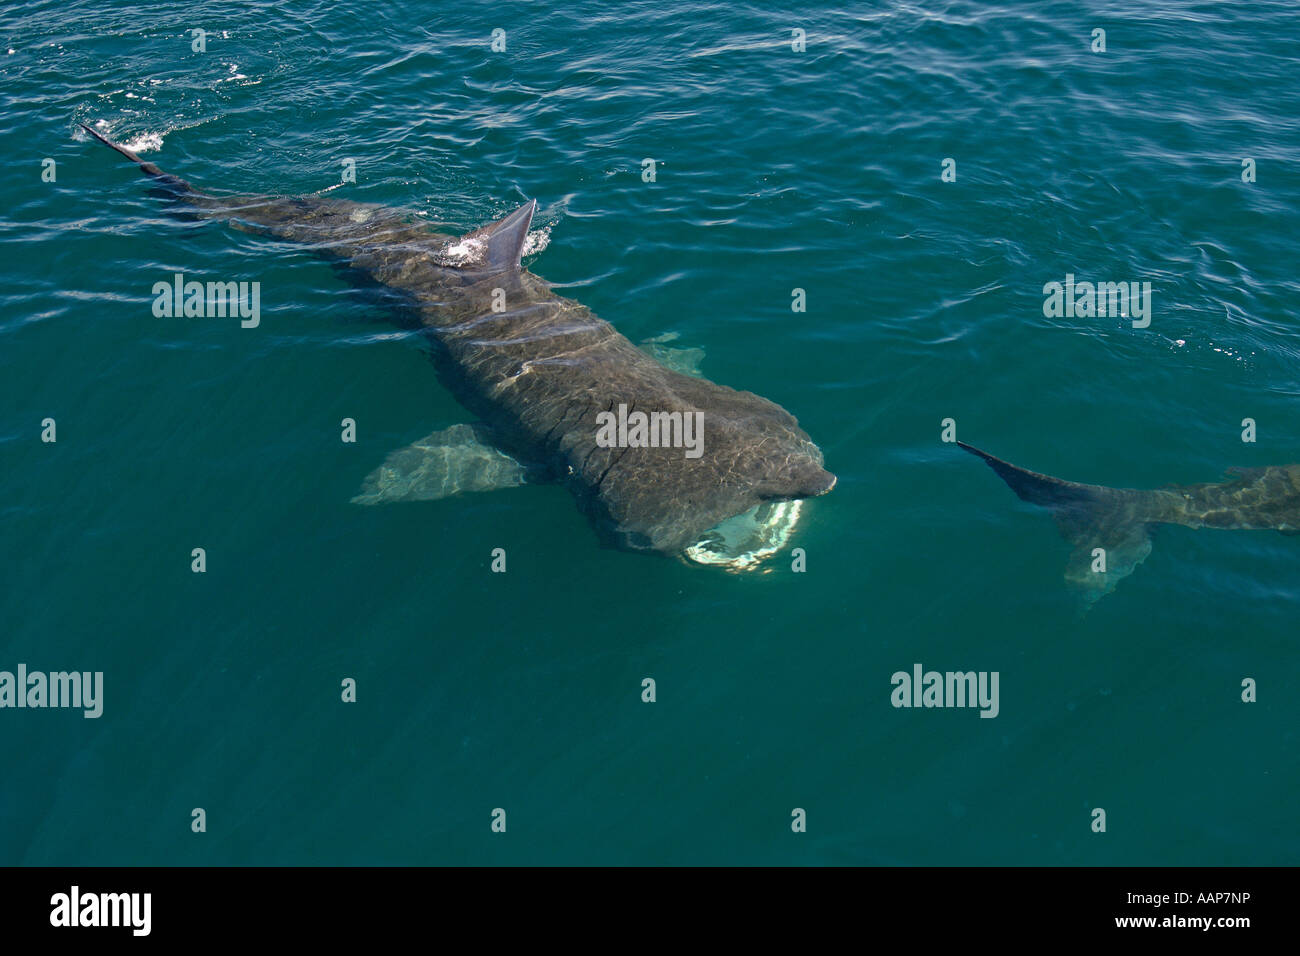 Basking sharks Cetorhinus maximus filter feeding near isle of Coll Scotland June - Stock Image